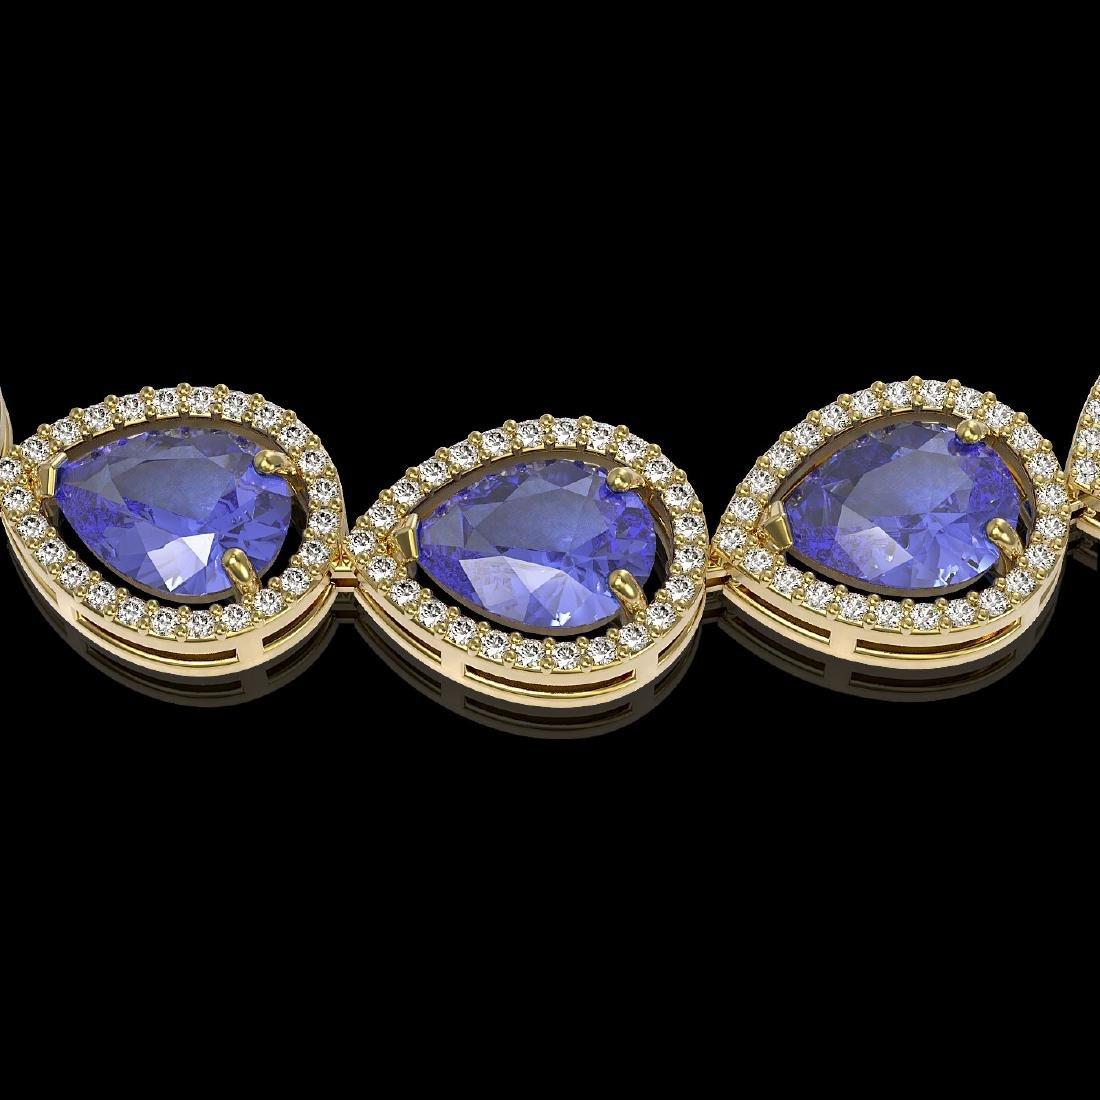 44.8 CTW Tanzanite & Diamond Halo Necklace 10K Yellow - 3